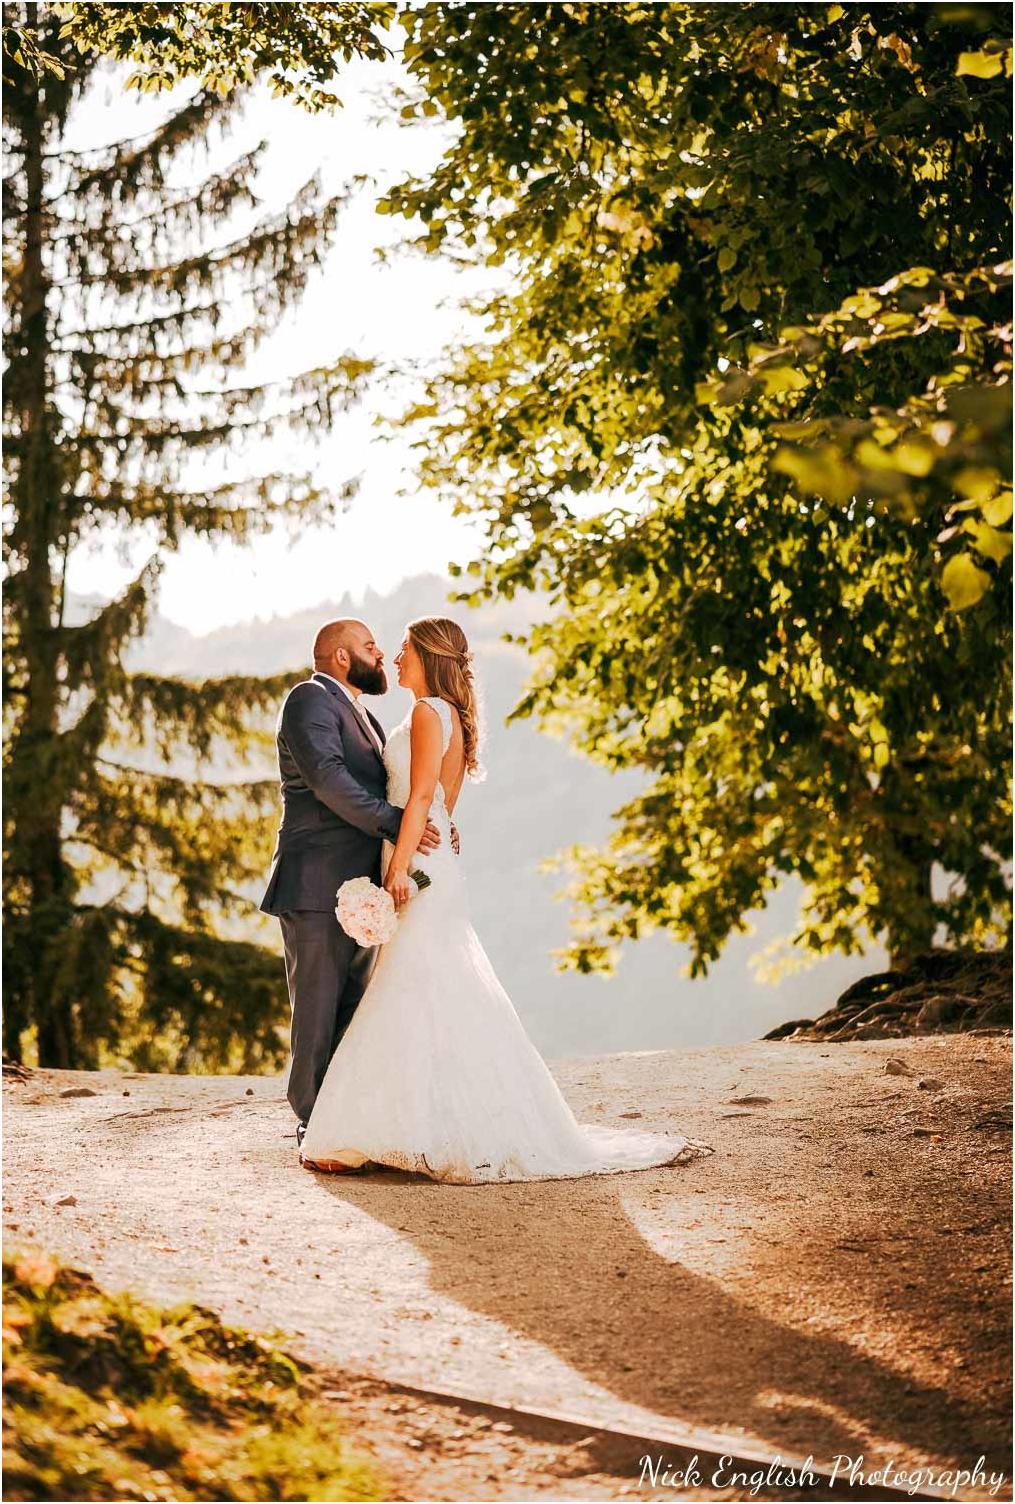 Destination_Wedding_Photographer_Slovenia_Nick_English_Photography-70-9.jpg